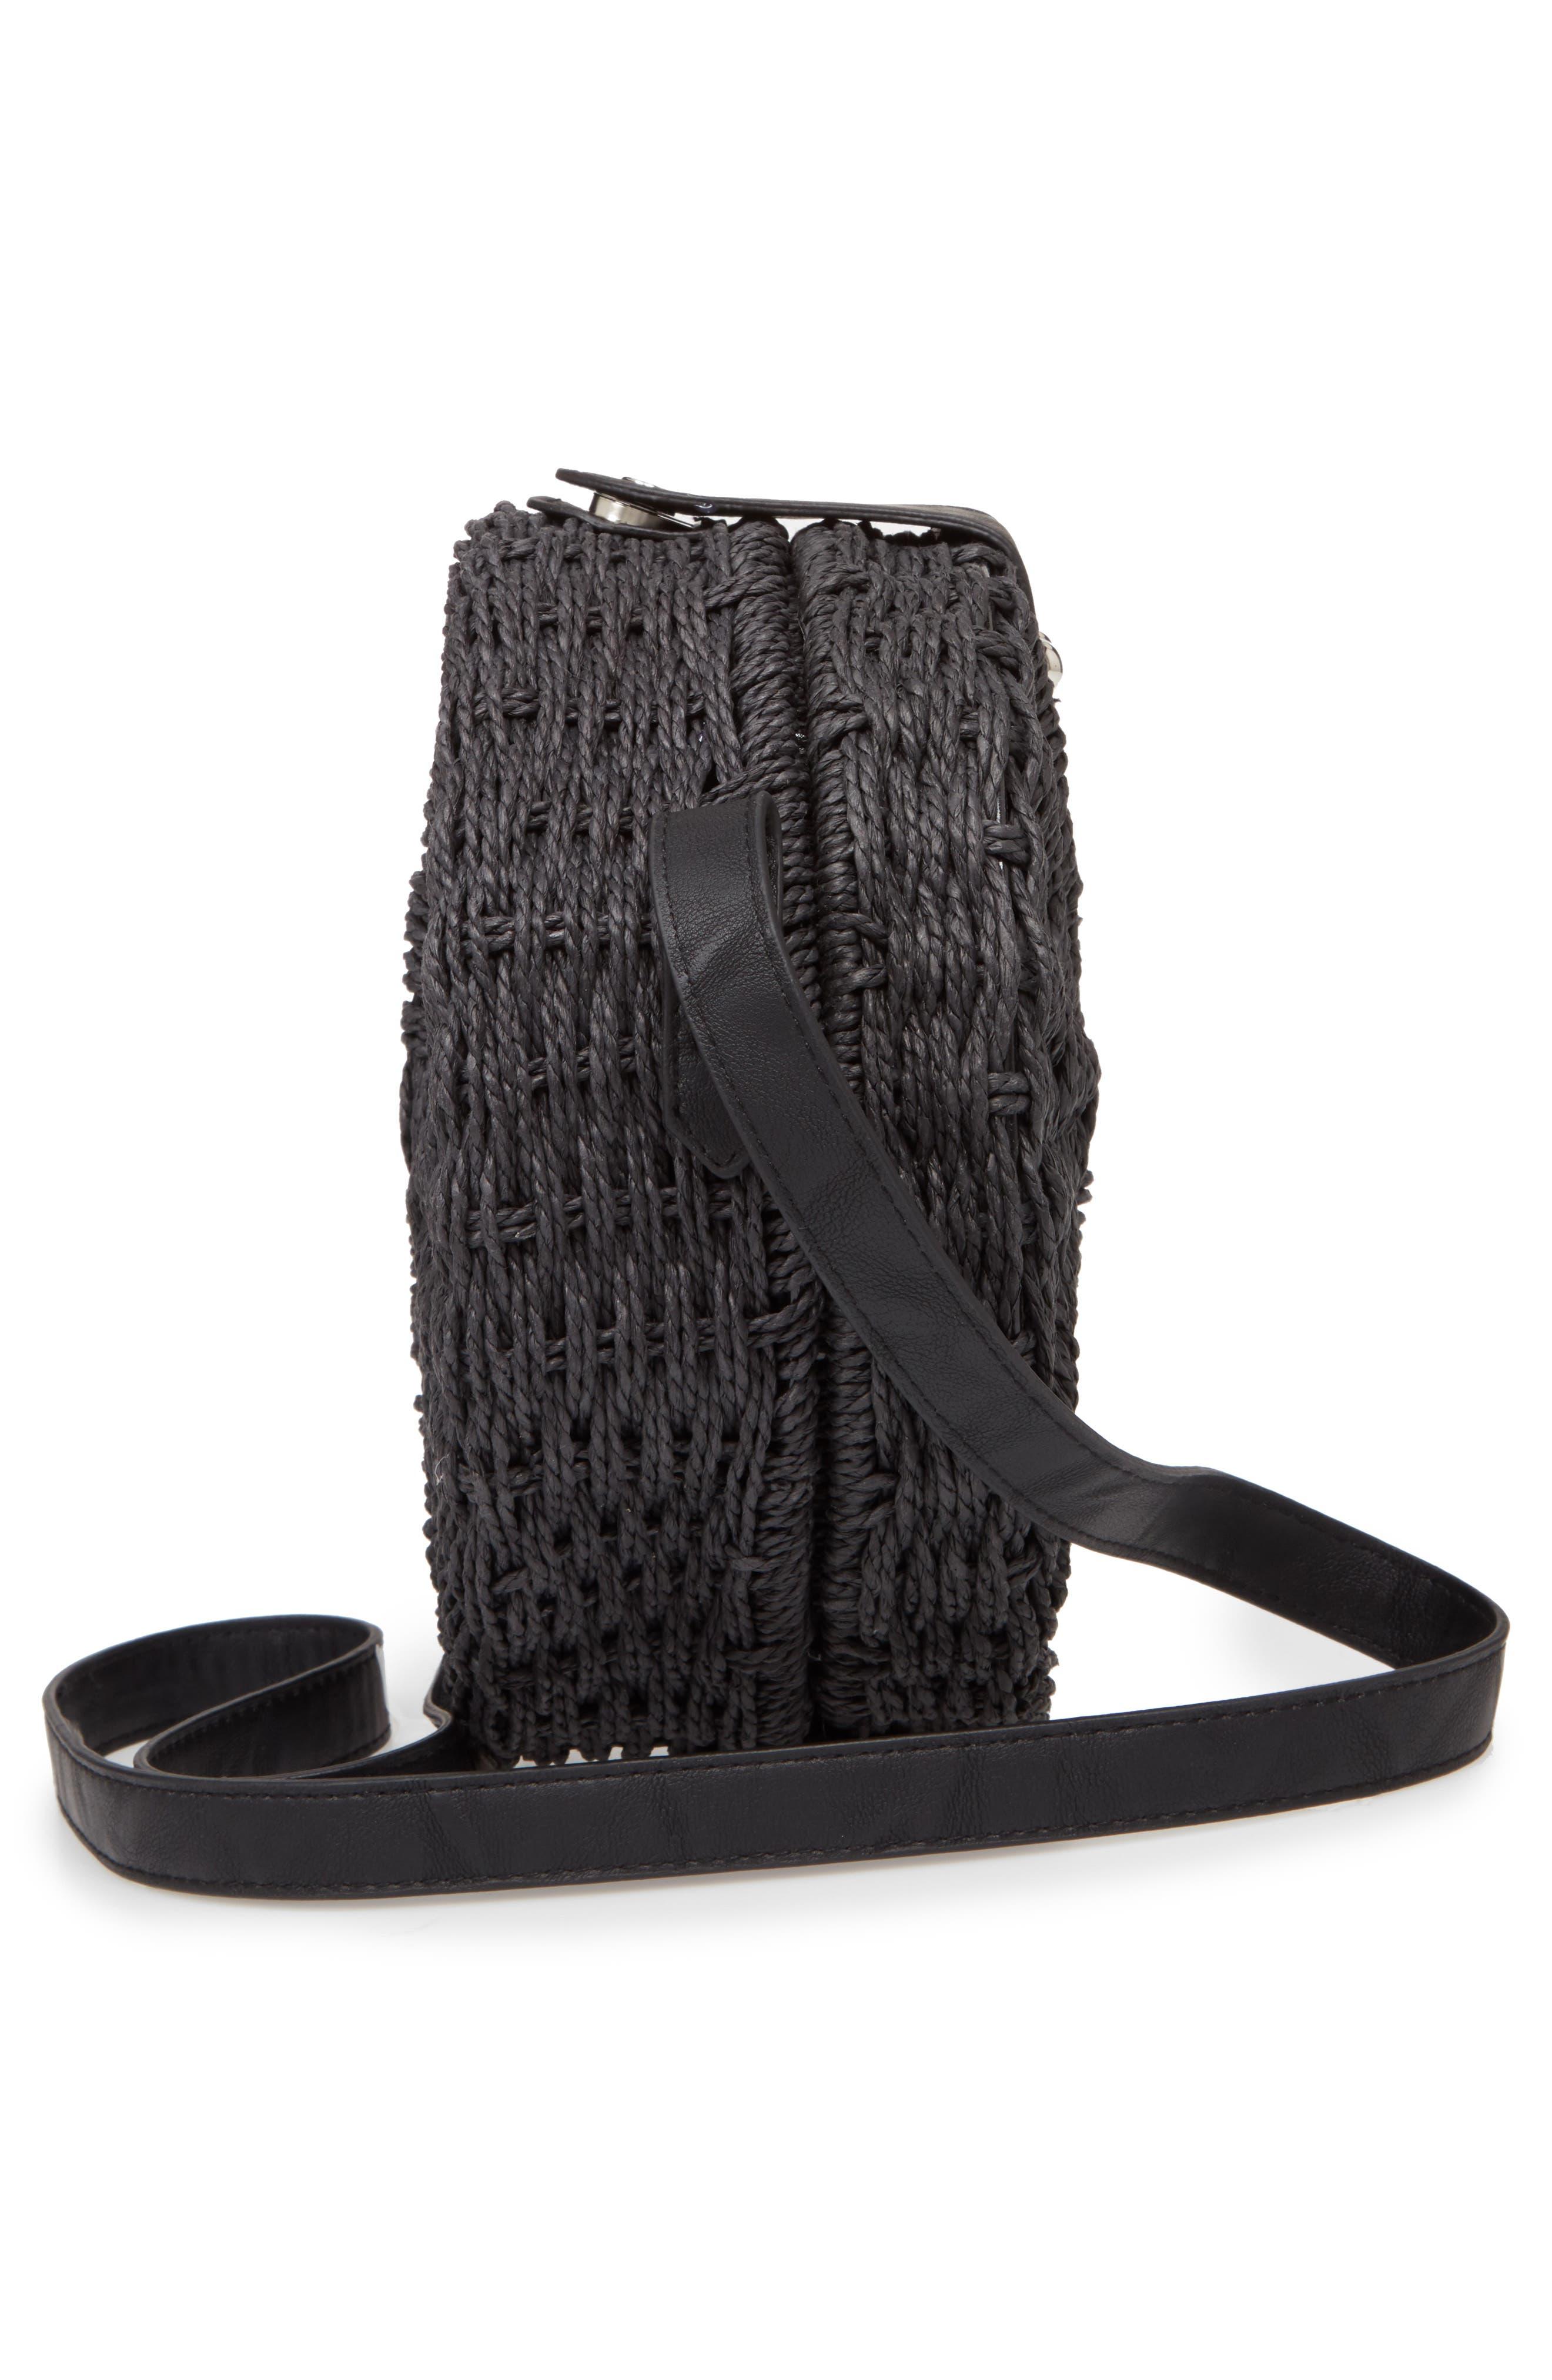 Barbar Straw Crossbody Bag,                             Alternate thumbnail 5, color,                             001